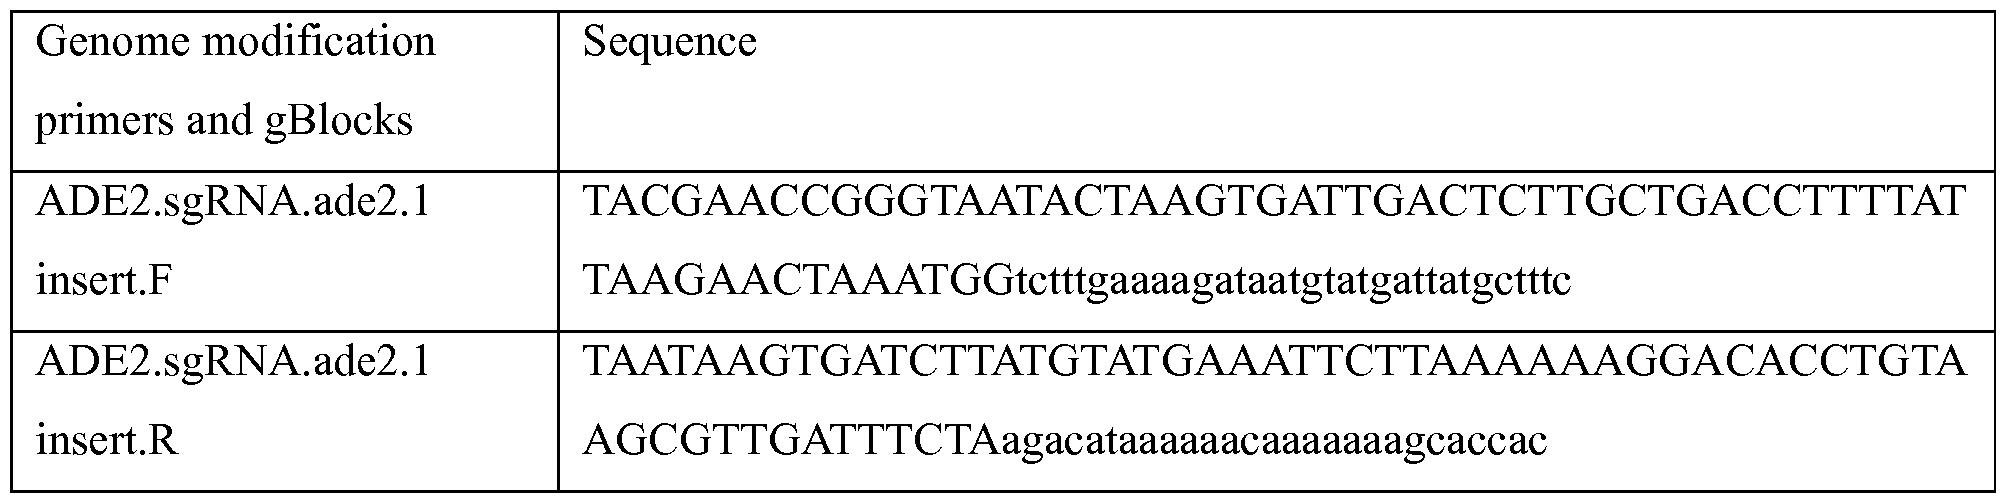 WO2015105928A1 - Rna-guided gene drives - Google Patents